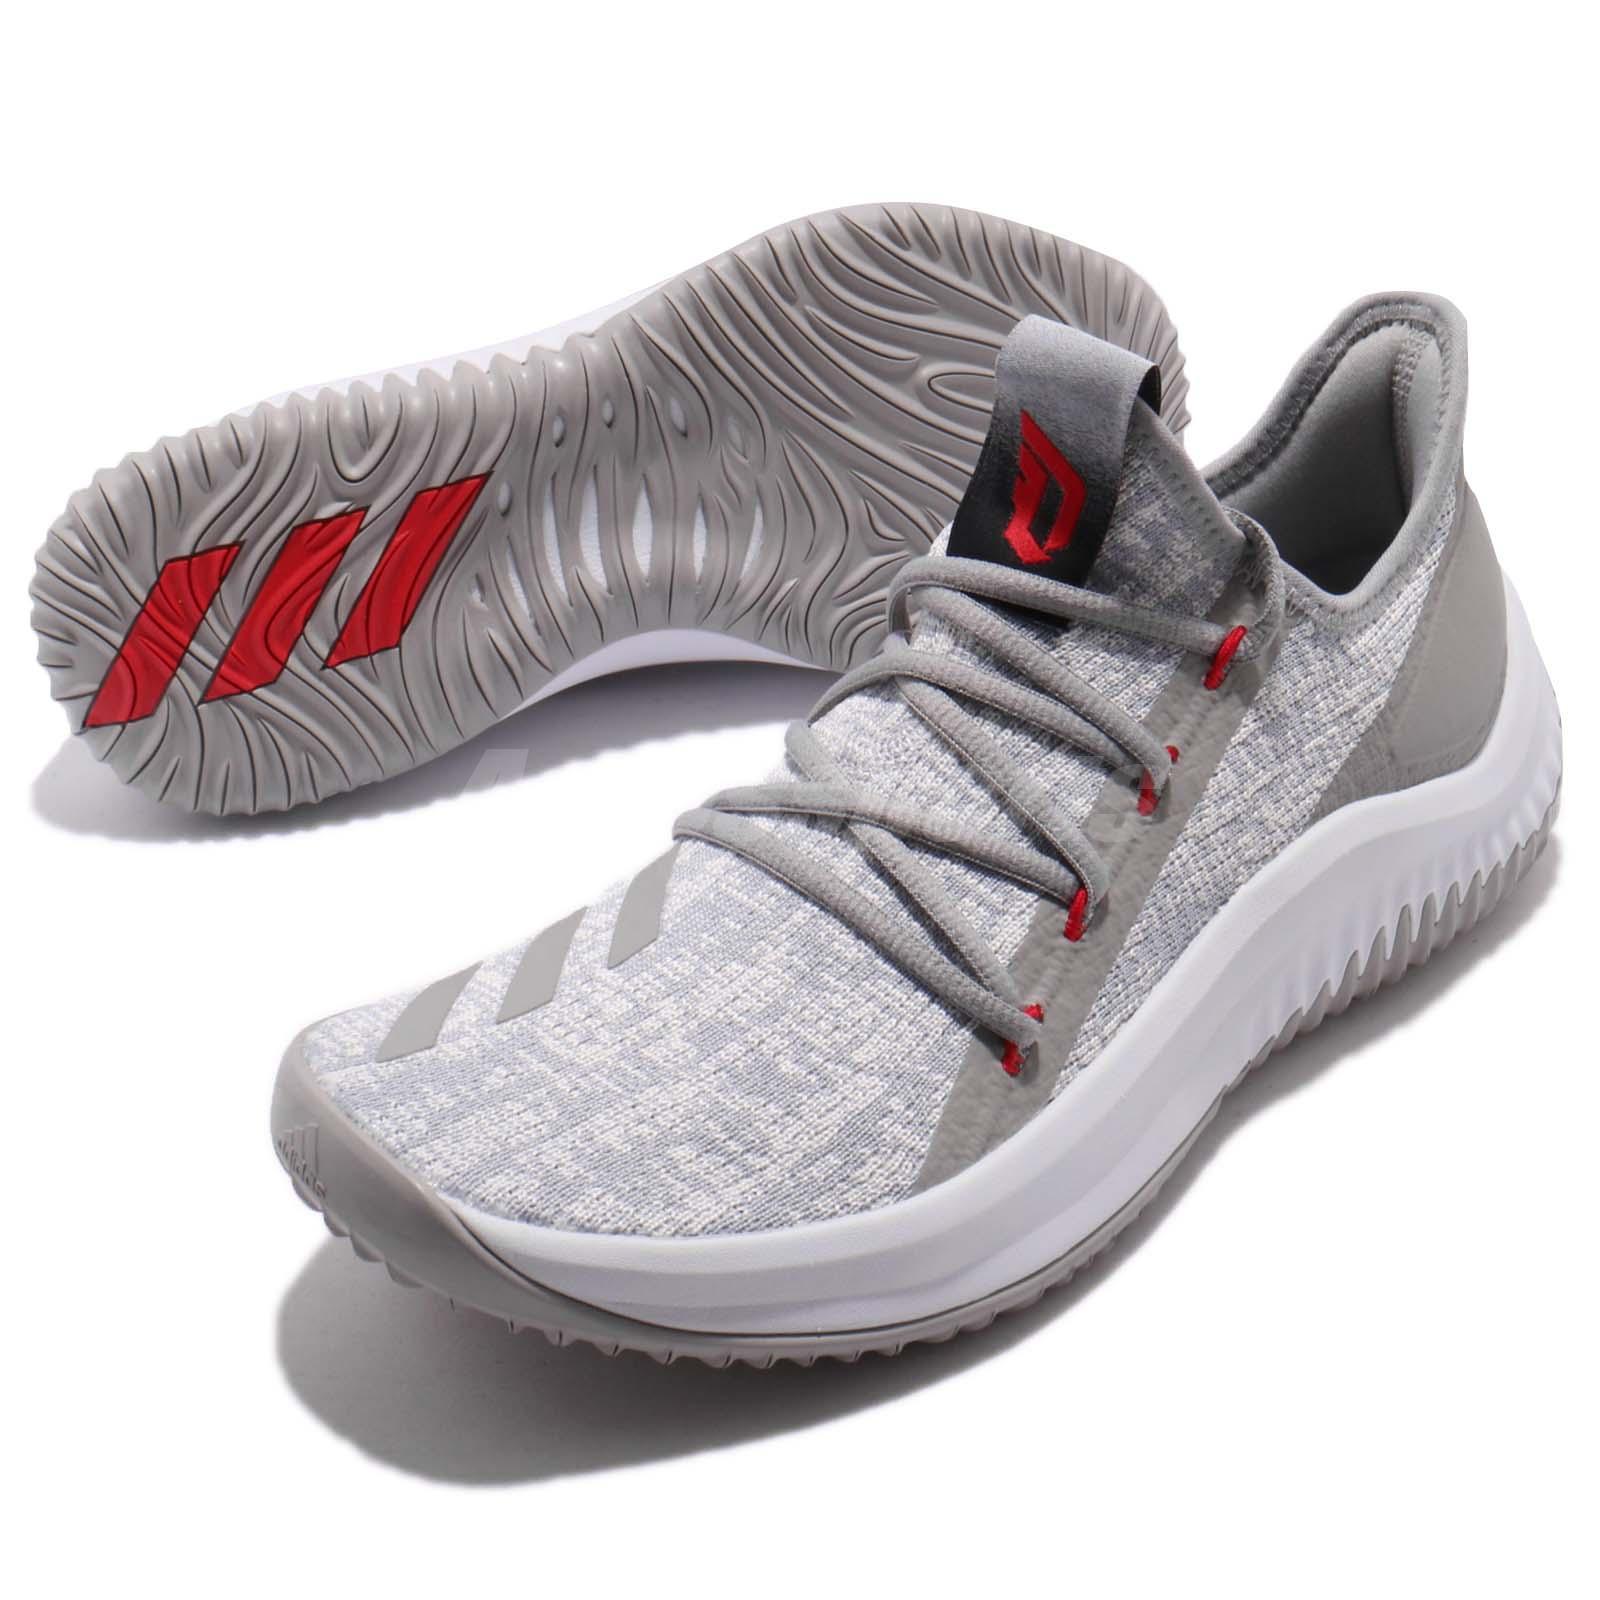 newest dc845 c2dc2 Details about adidas Dame D.O.L.L.A. Damian Lillard Grey White Men  Basketball Sneakers DB1073